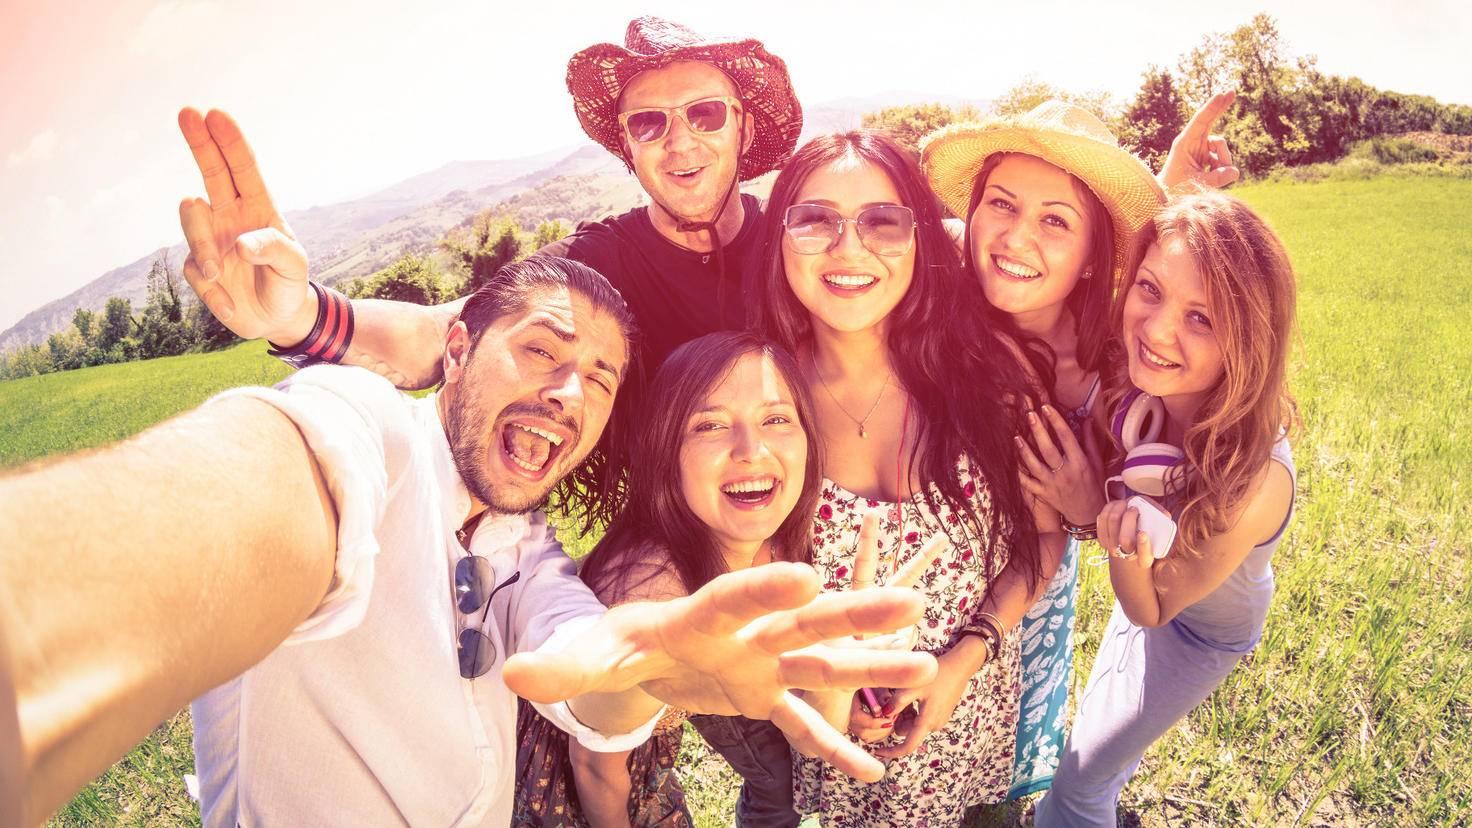 Groupe Selfie 475950394